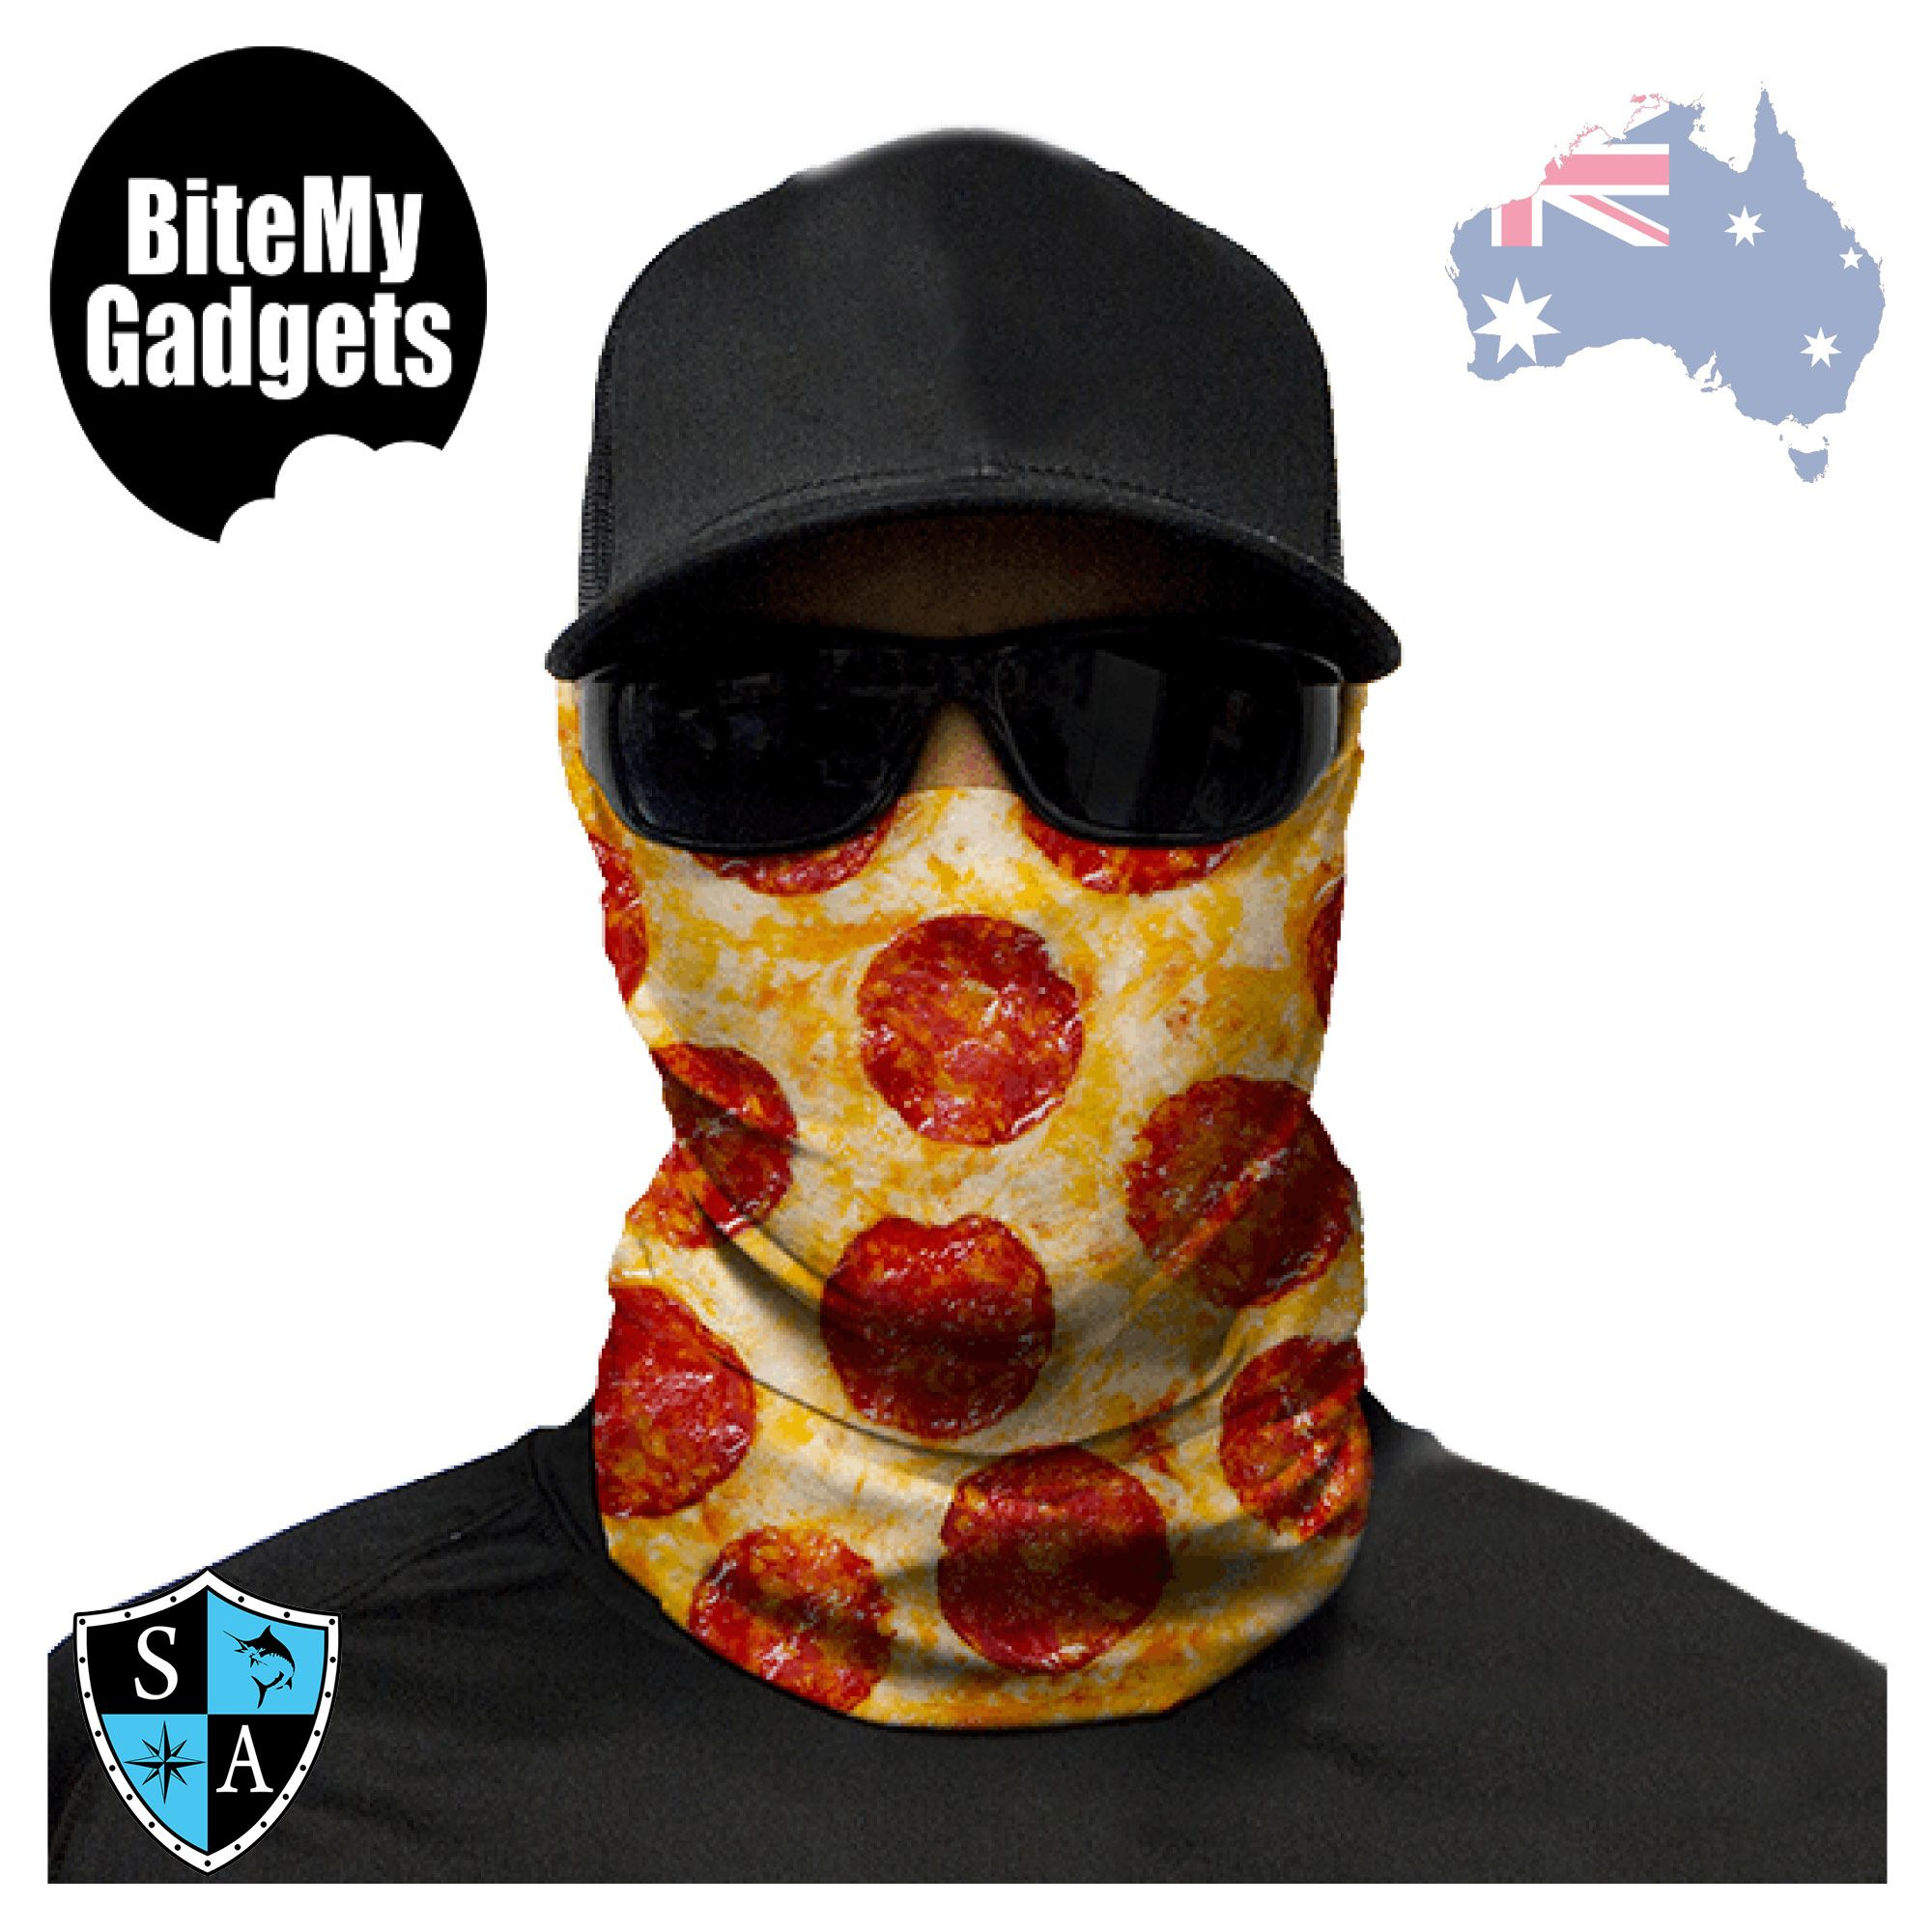 Details about SA Co - Face Shield - PIZZA - Bandana Durag Neck Scarf  Headwear UV Mask Sock 97ad5431743